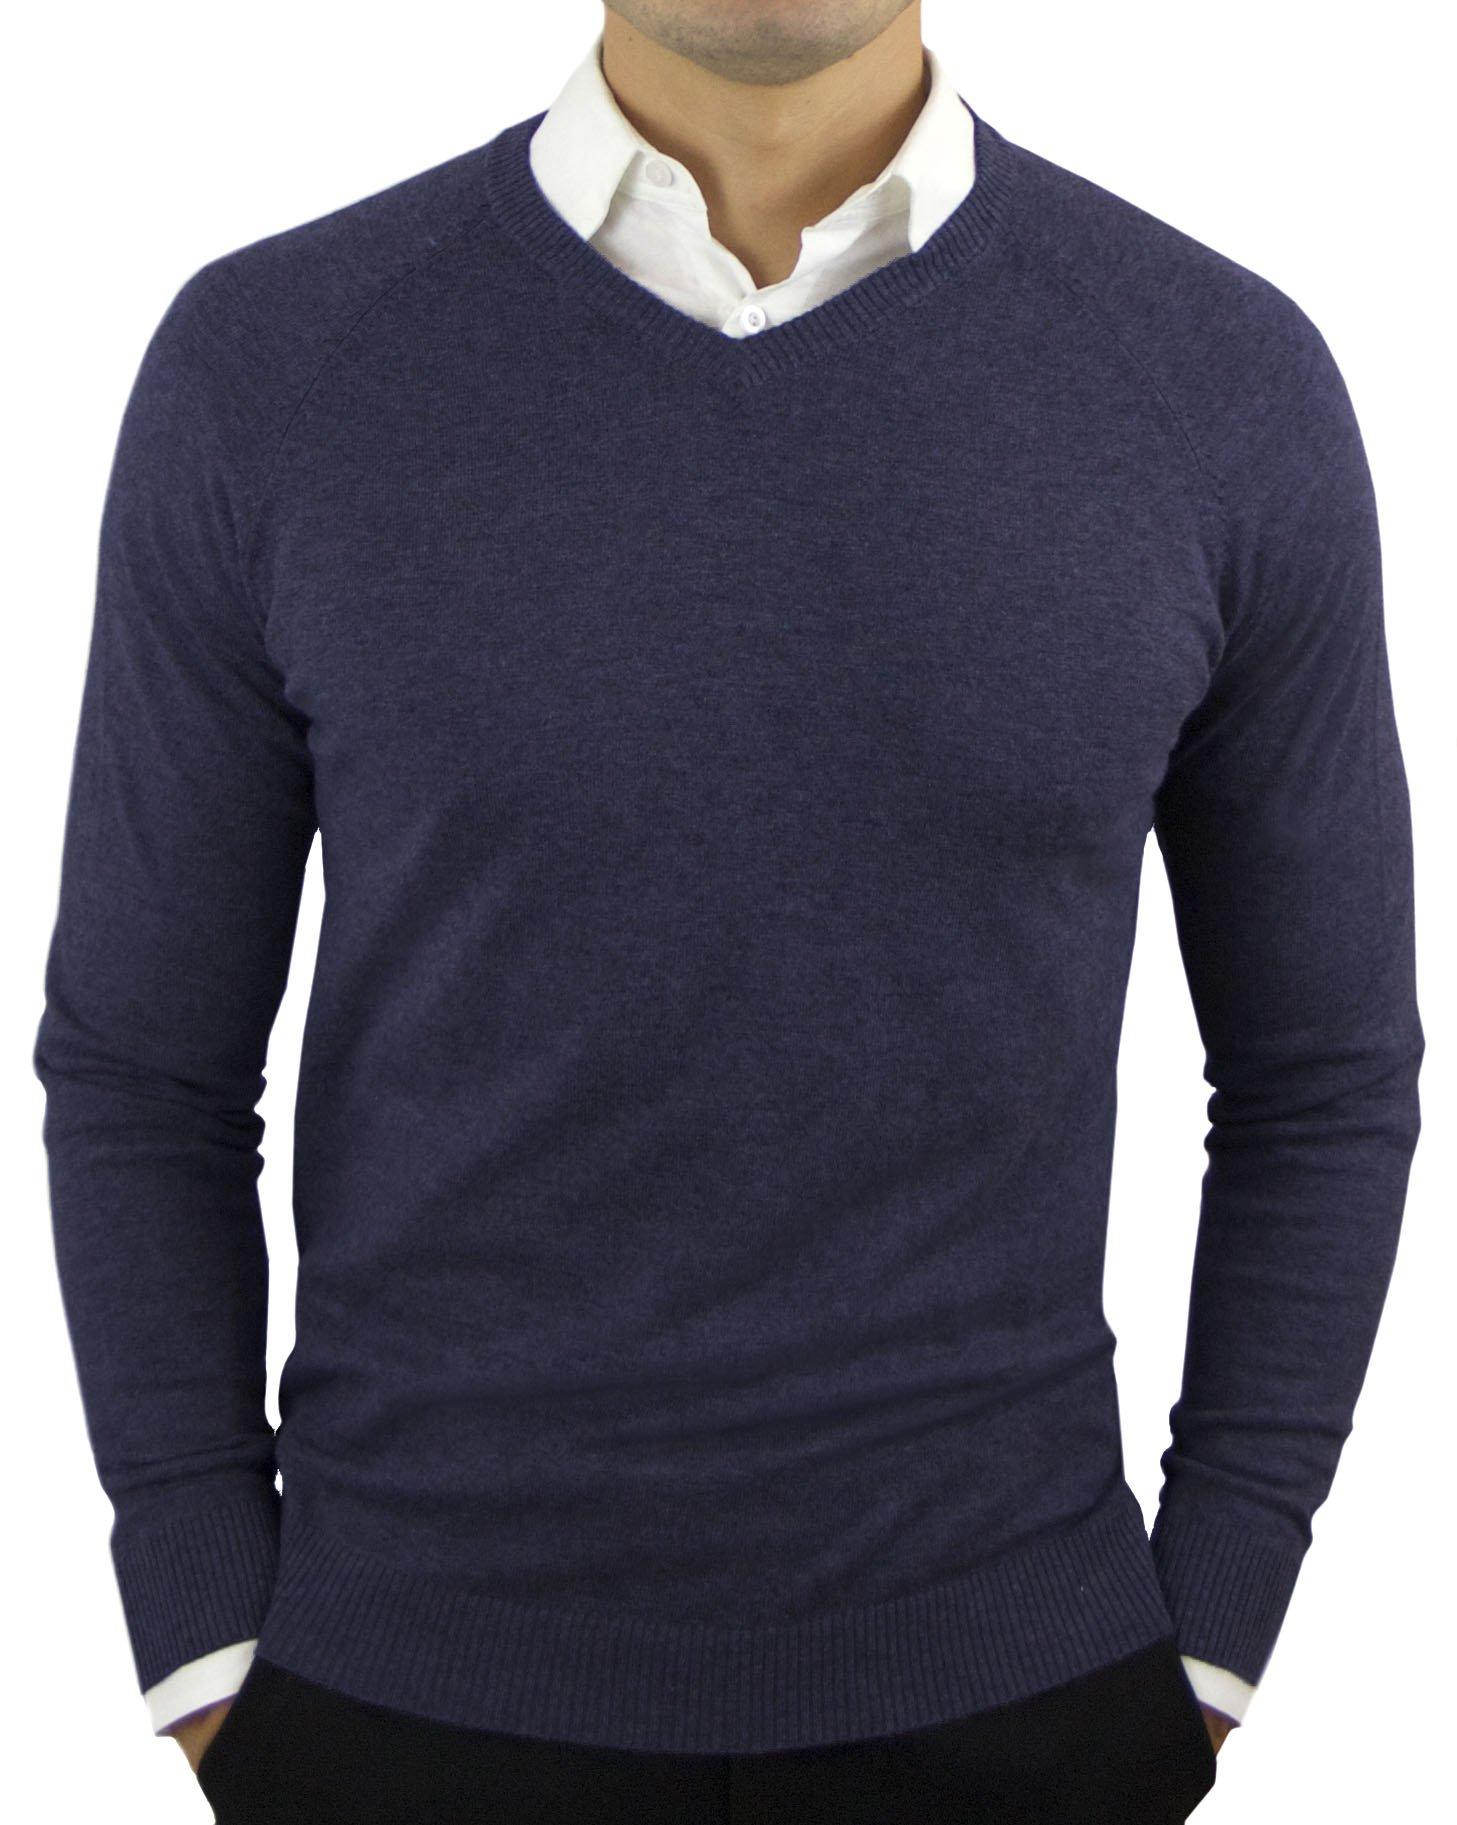 Comfortably Collared Men's Perfect Slim Fit V-Neck Sweater (Medium, Navy)